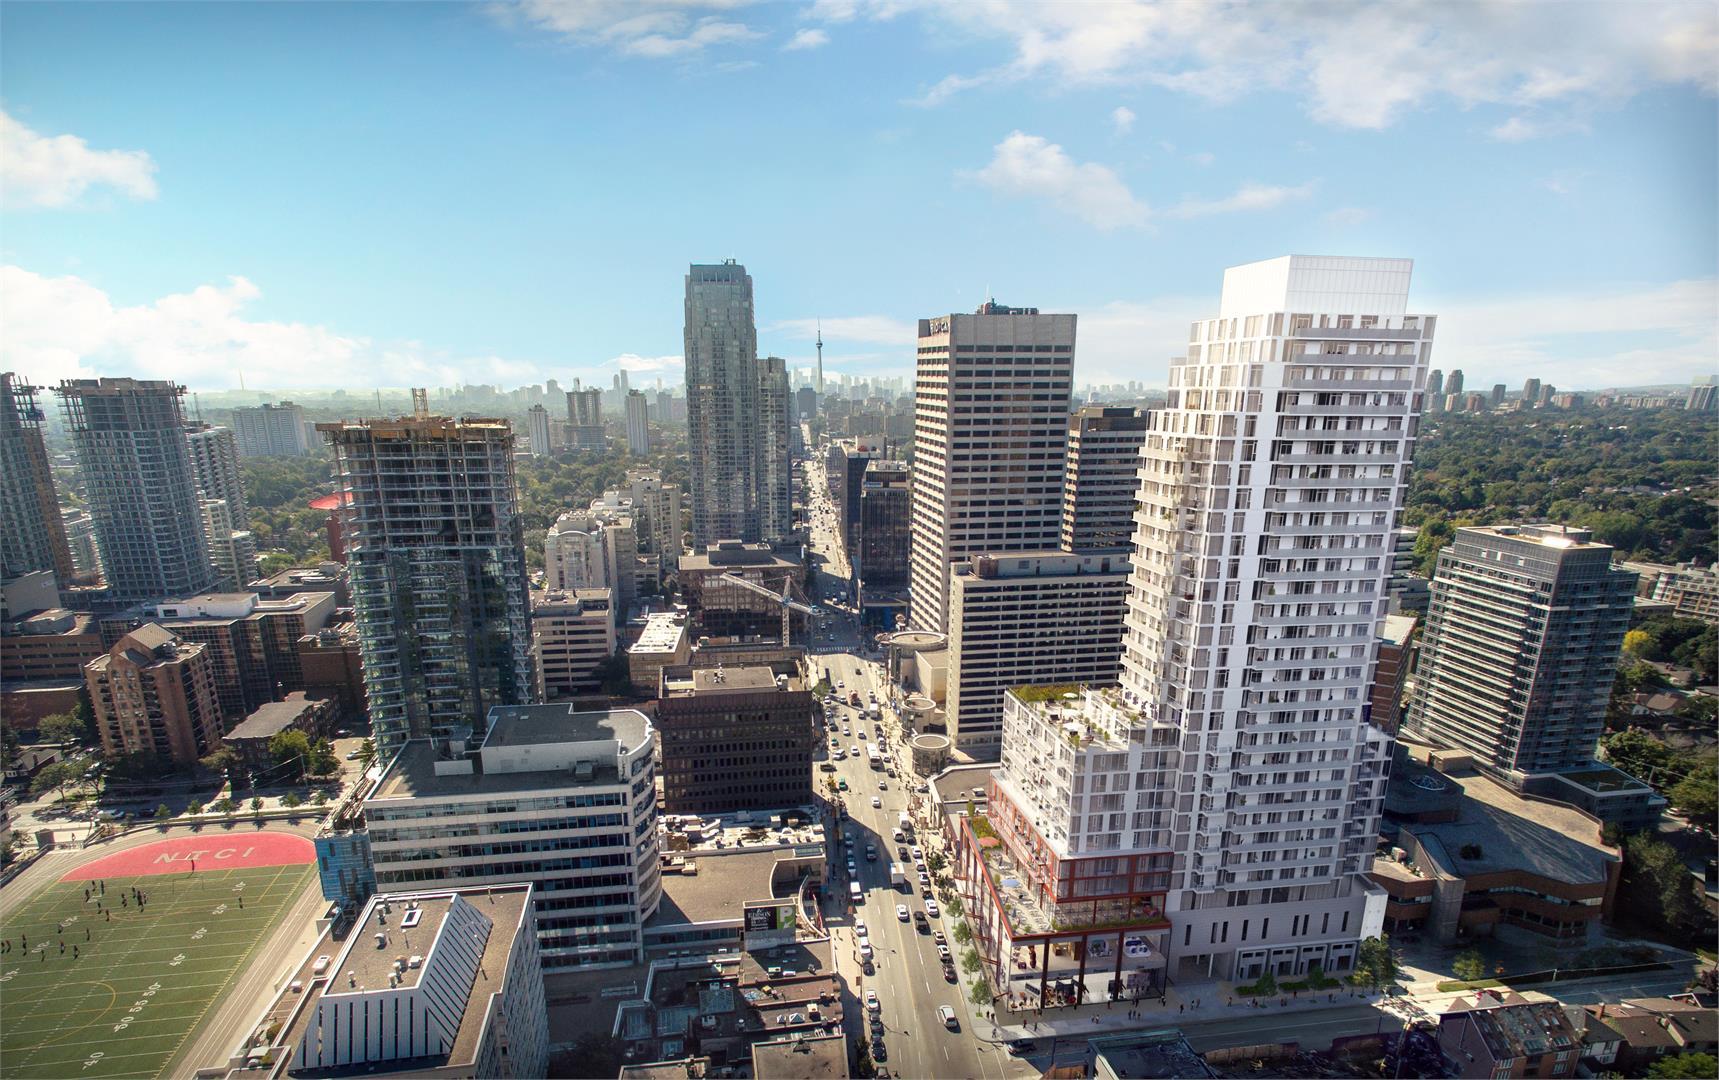 Whitehaus Condos Aerial View Toronto, Canada